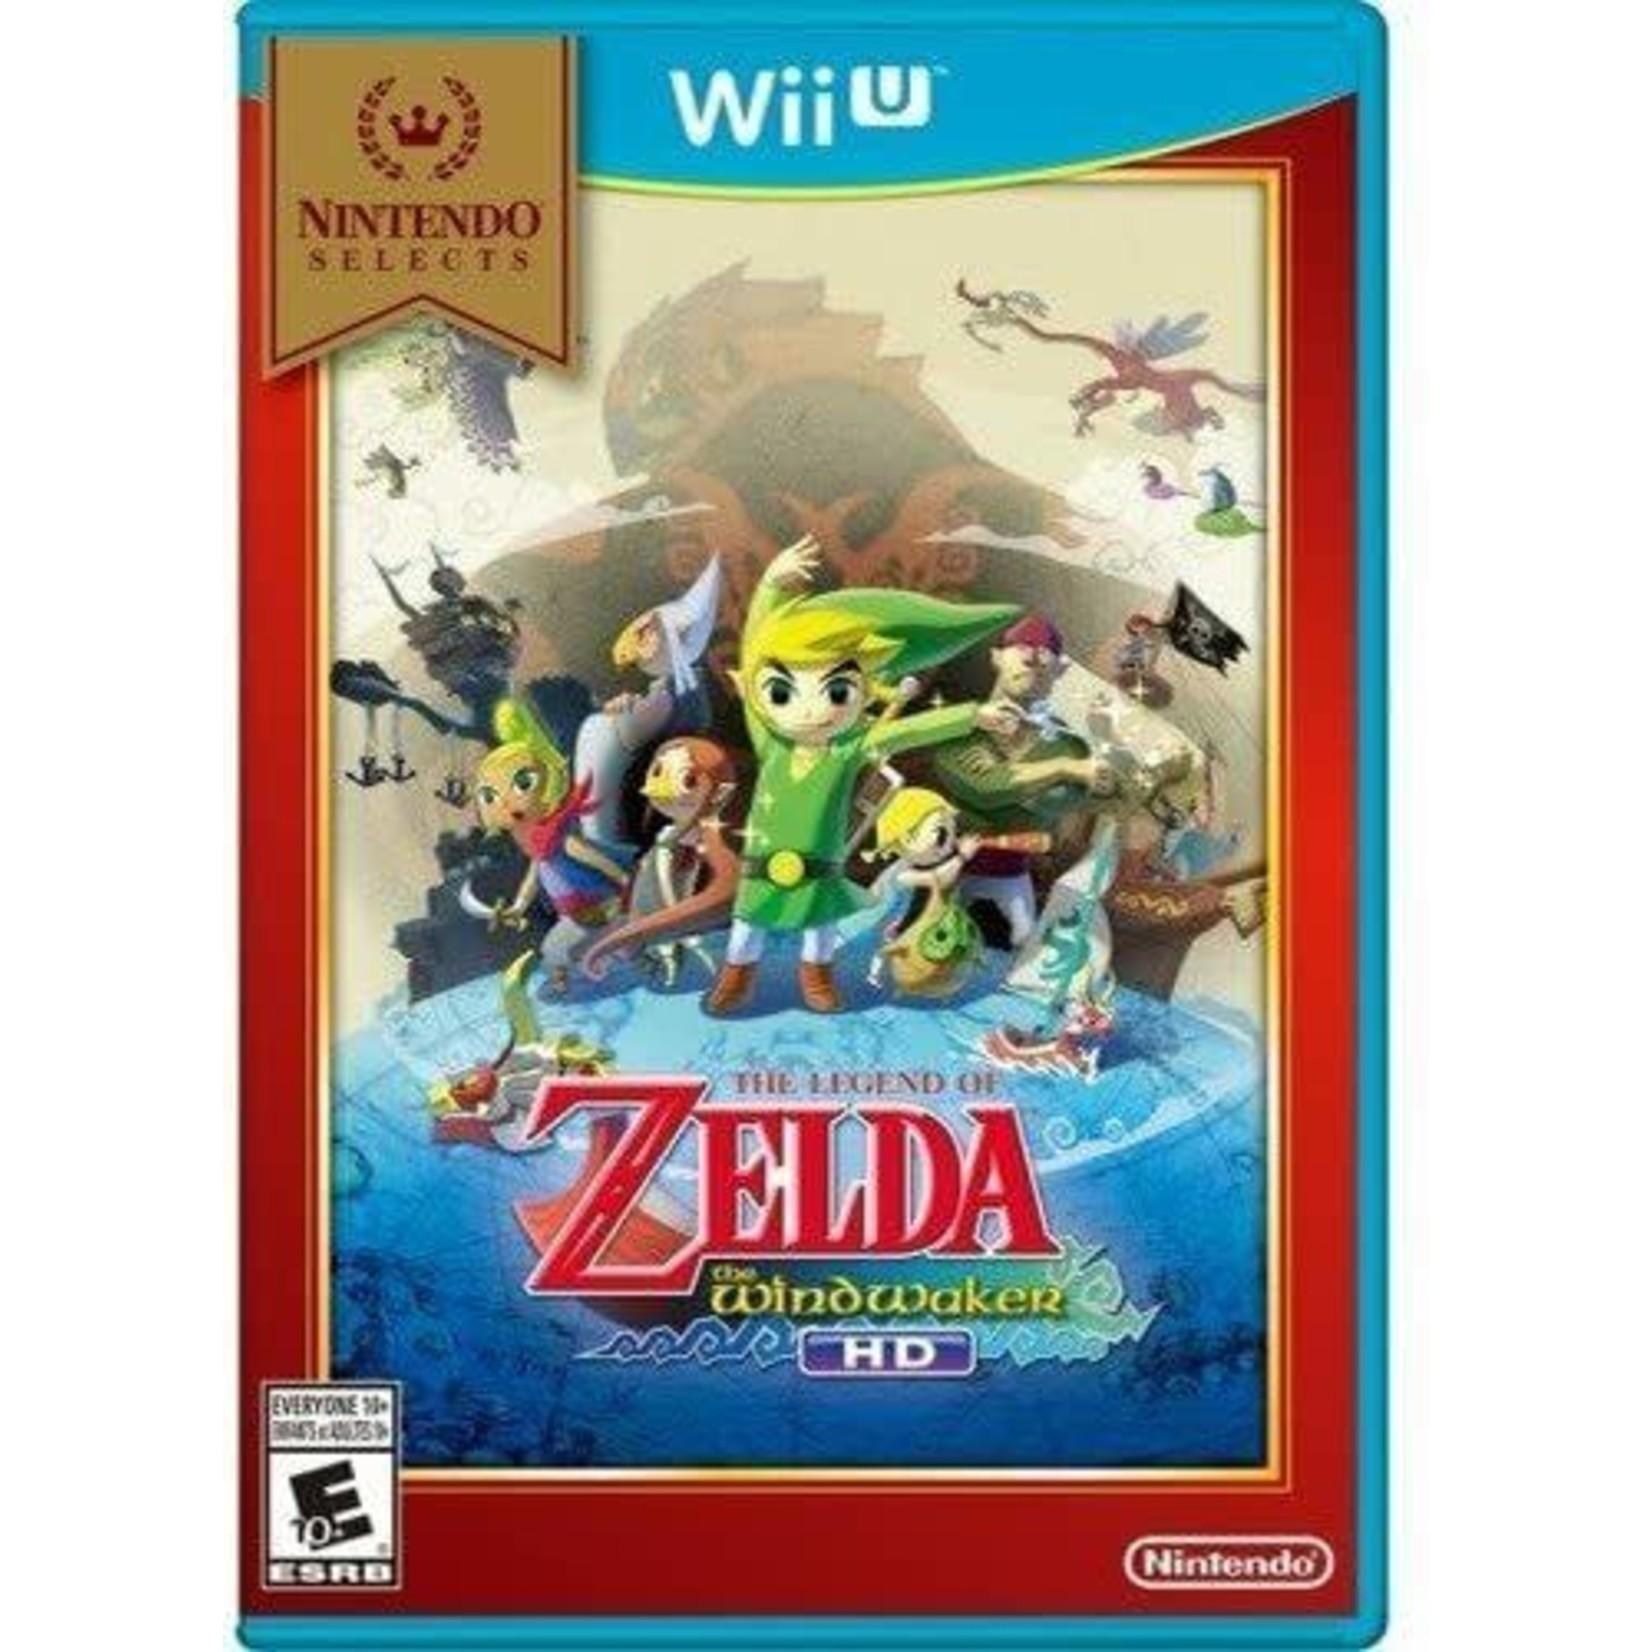 WIIU-The Legend of Zelda: The Windwaker HD